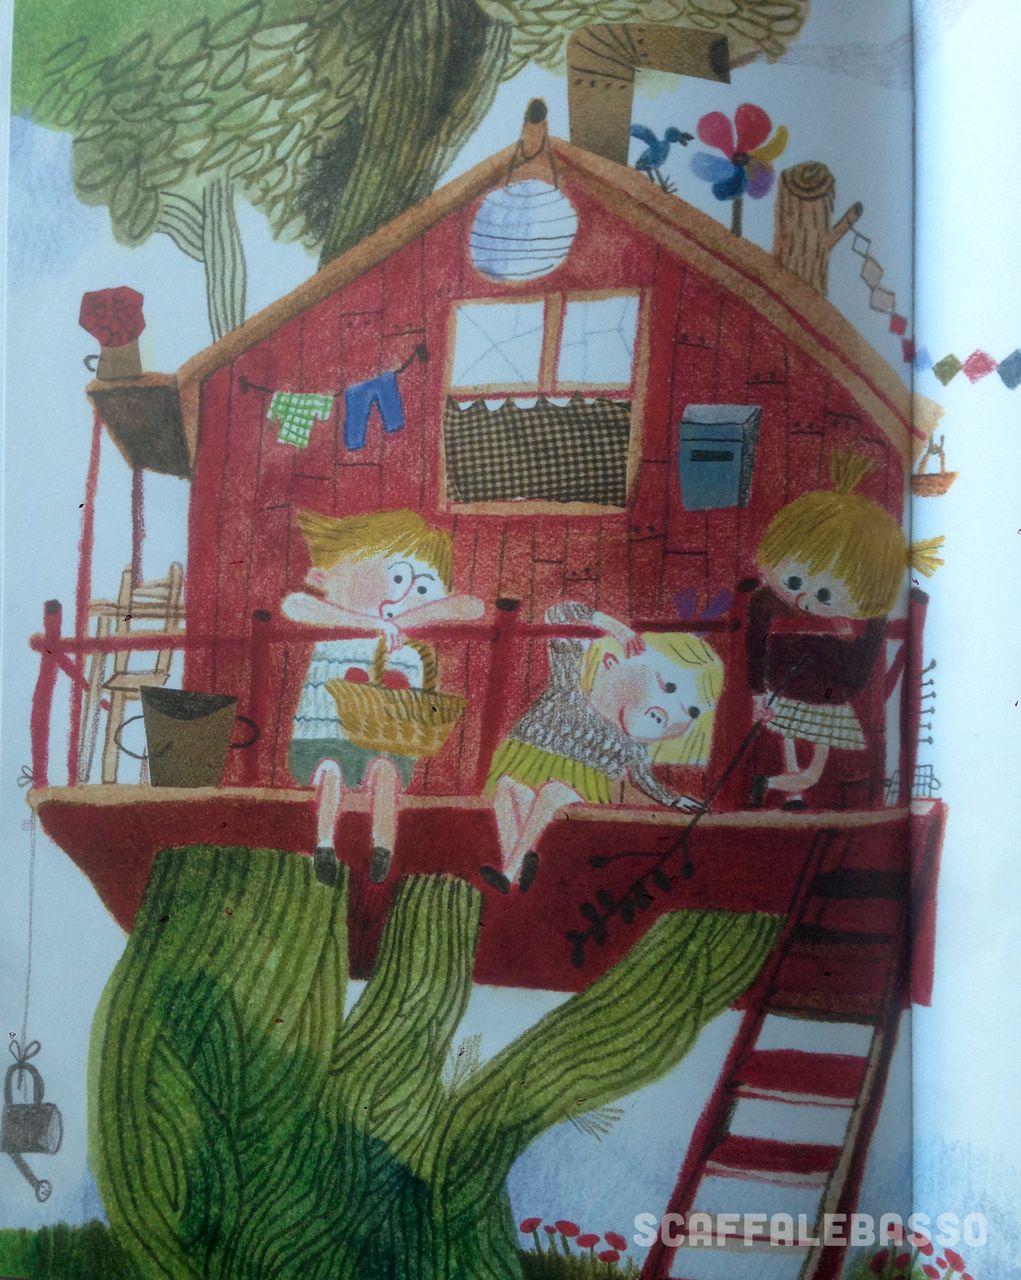 Astrid Lindgren, Beatrice Alemagna, Lotta combinaguai, Mondadori